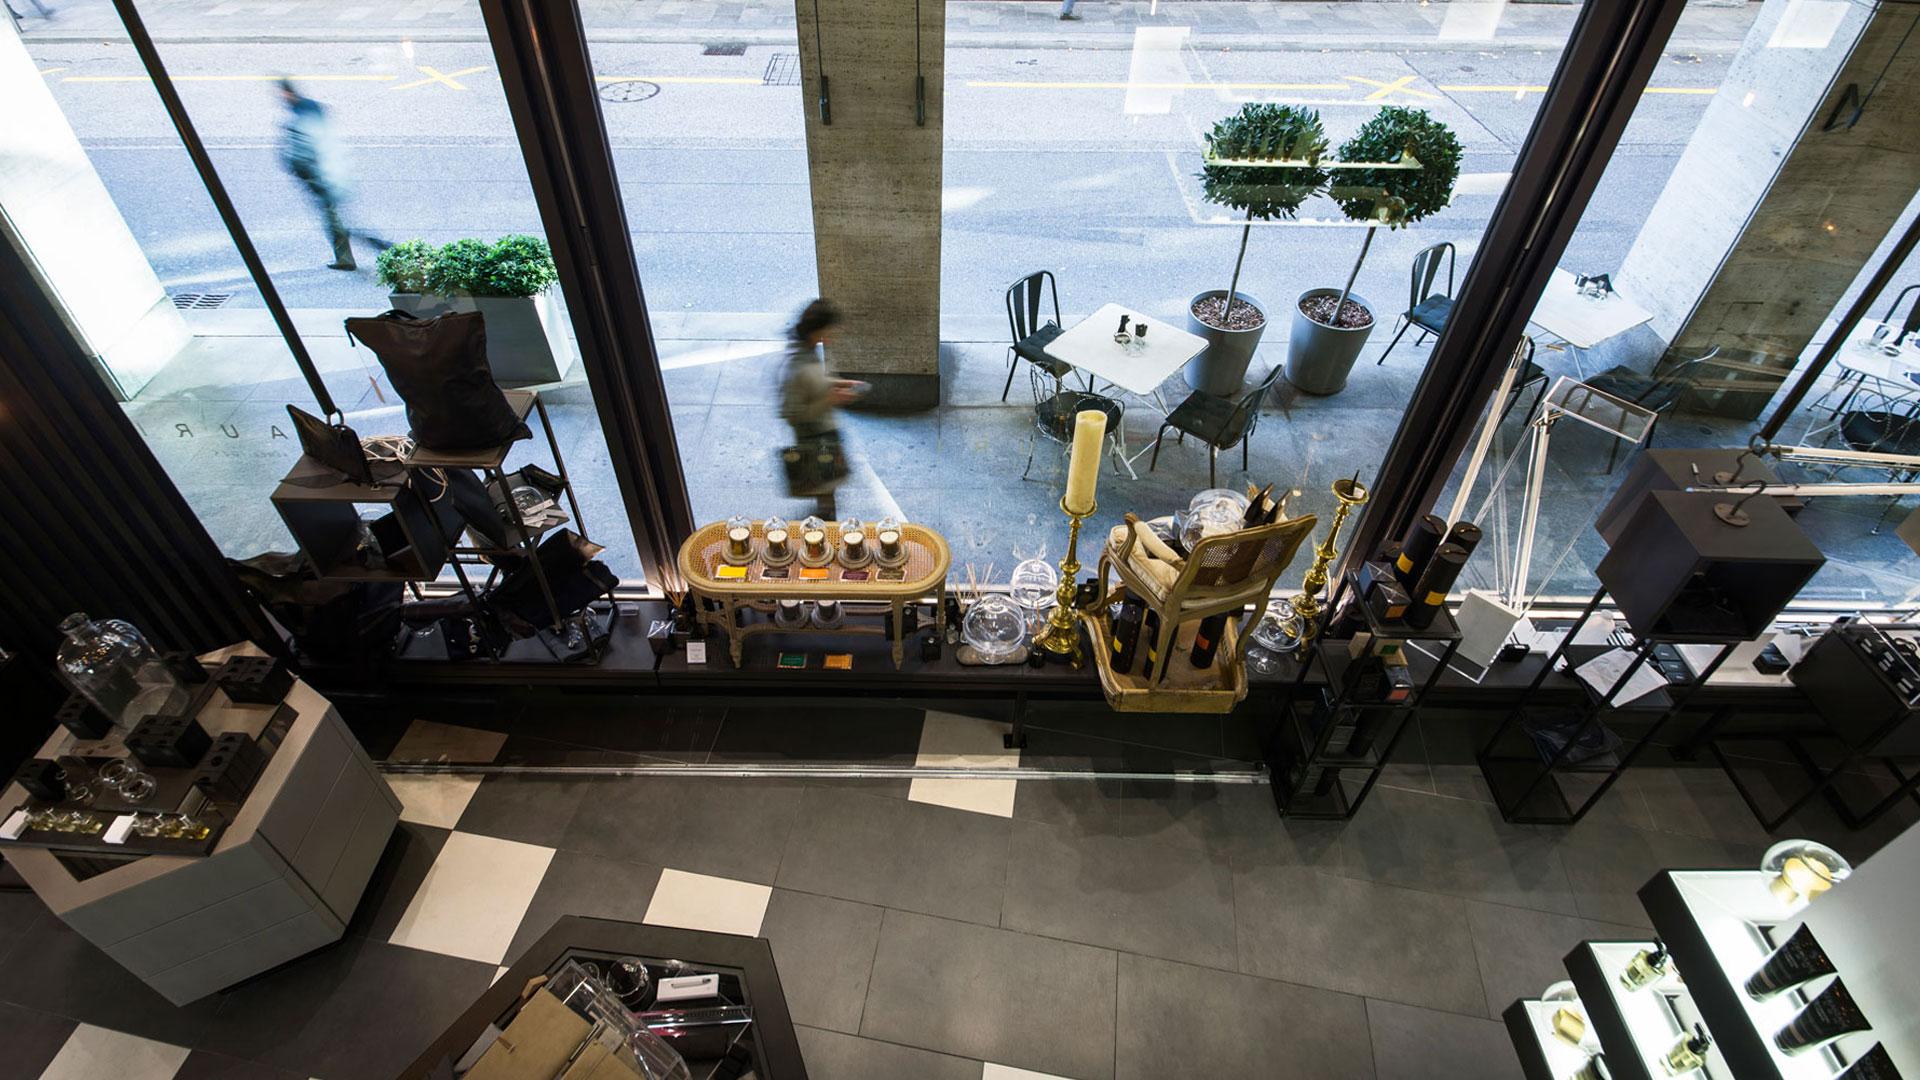 Retail: Mauri Global Beauty Concept Store in Lugano - TM Italia - TM_CH_LU_MAURI_07